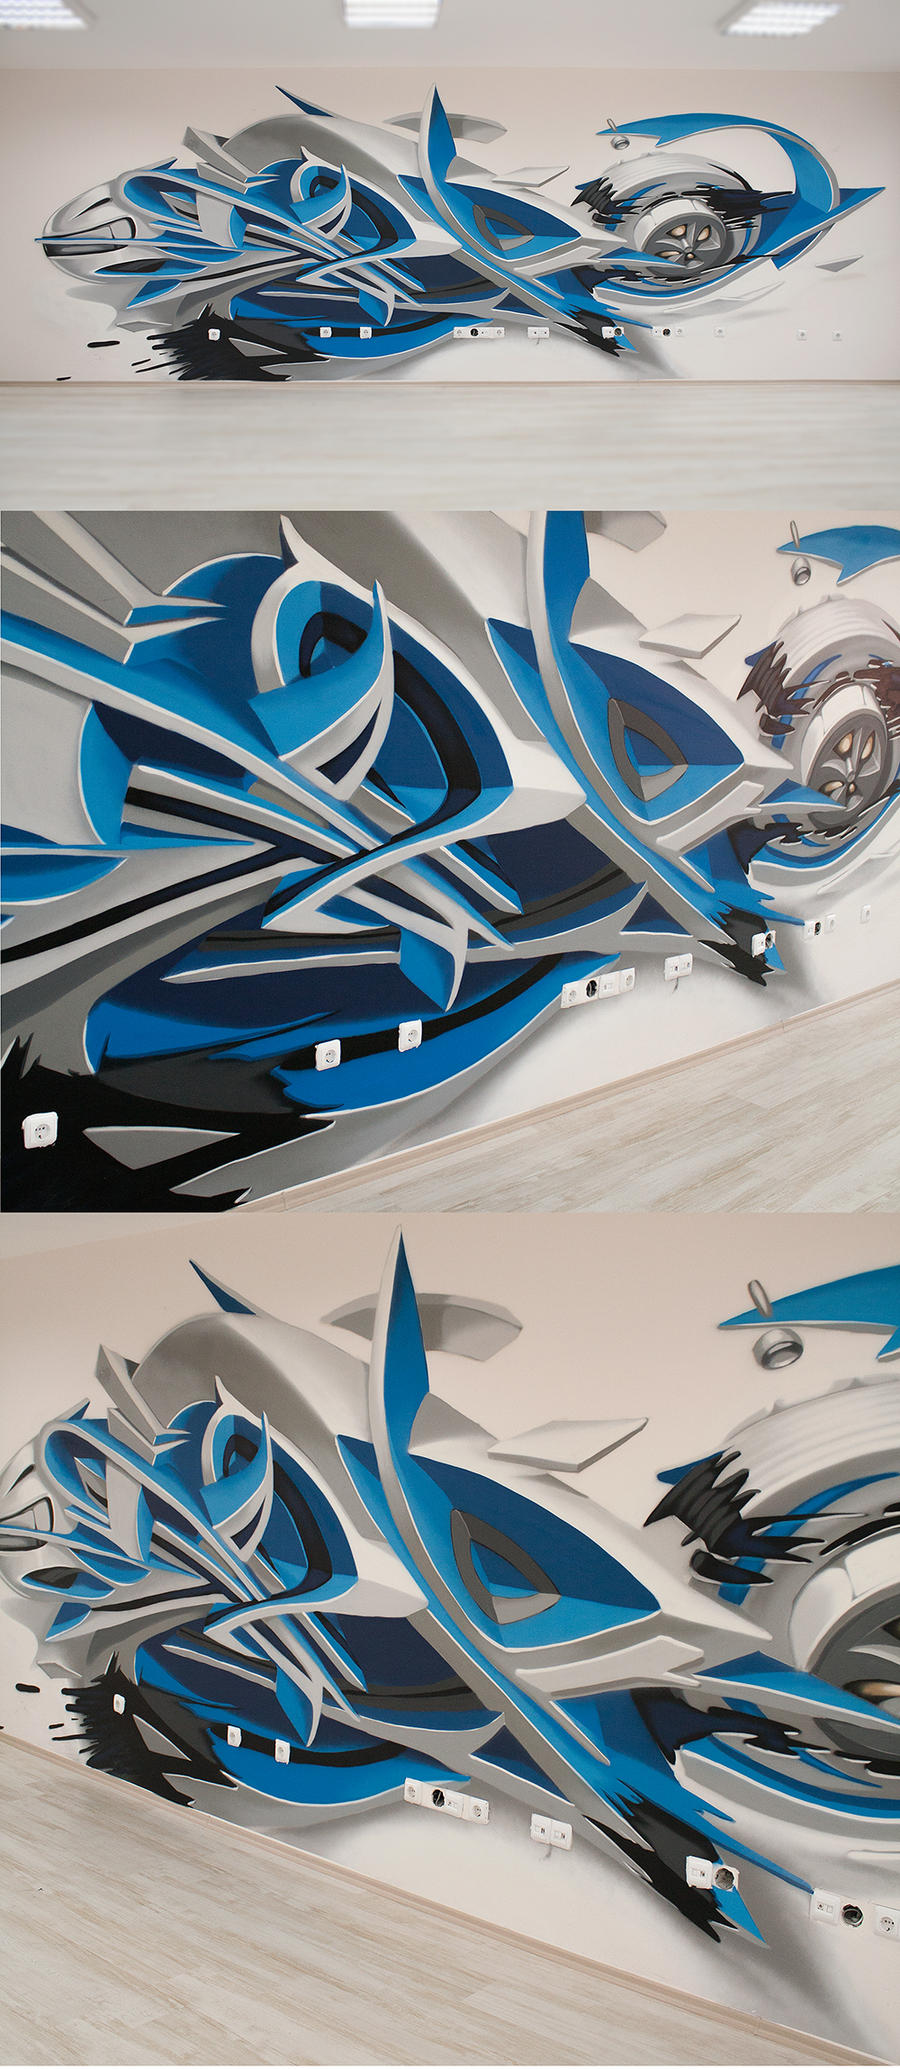 XPRO by stenDUC